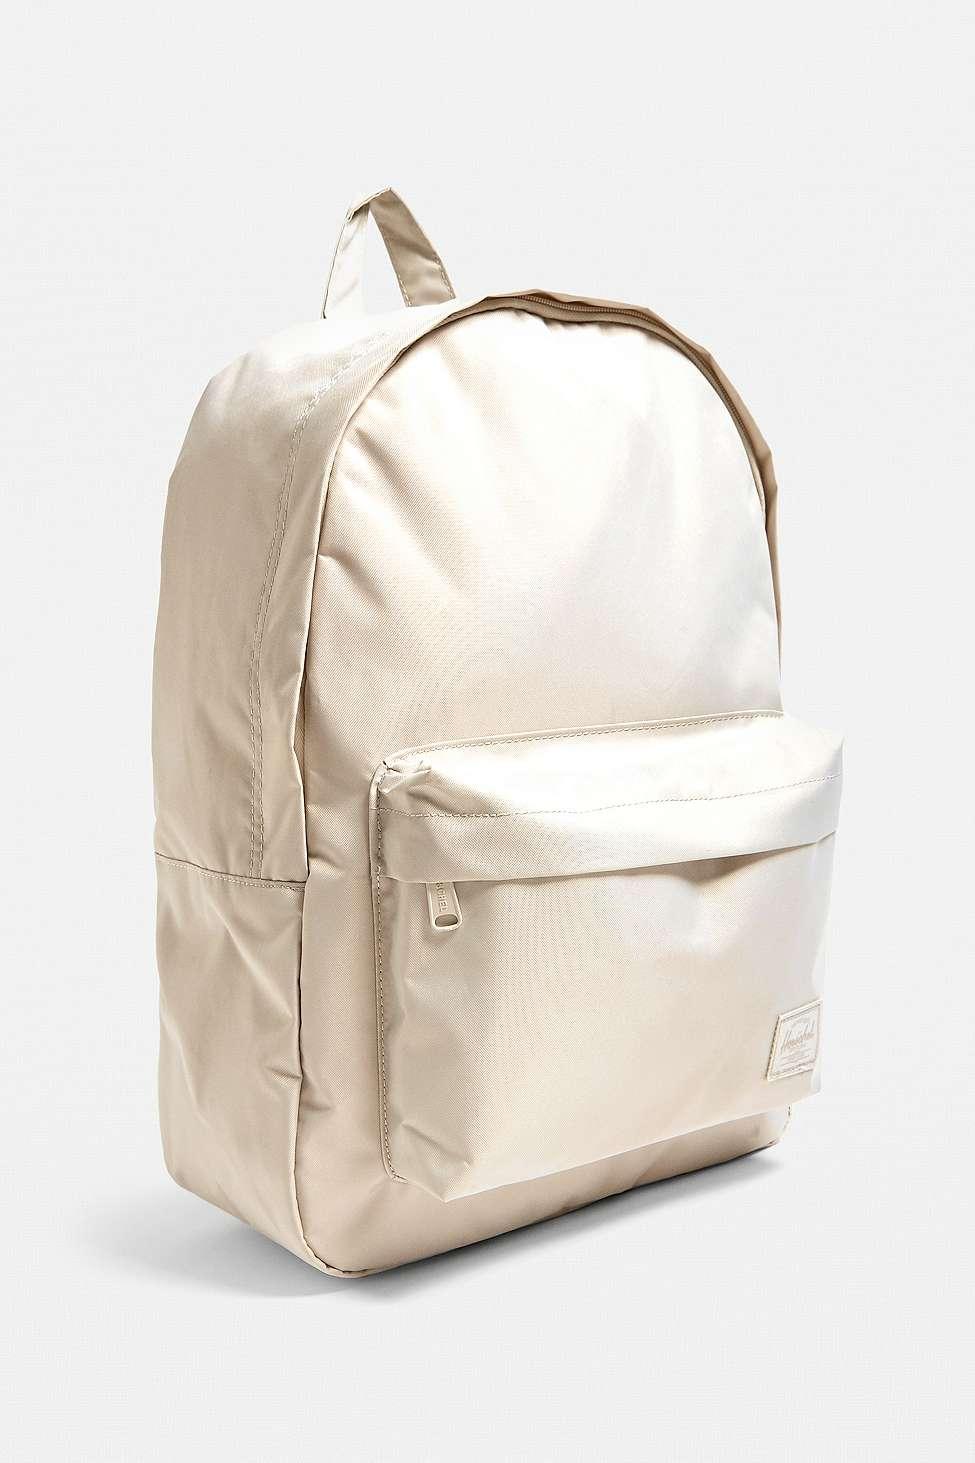 446e4602c77 Herschel Supply Co. - Multicolor Classic Light Moonstruck Backpack - Mens  All for Men -. View fullscreen